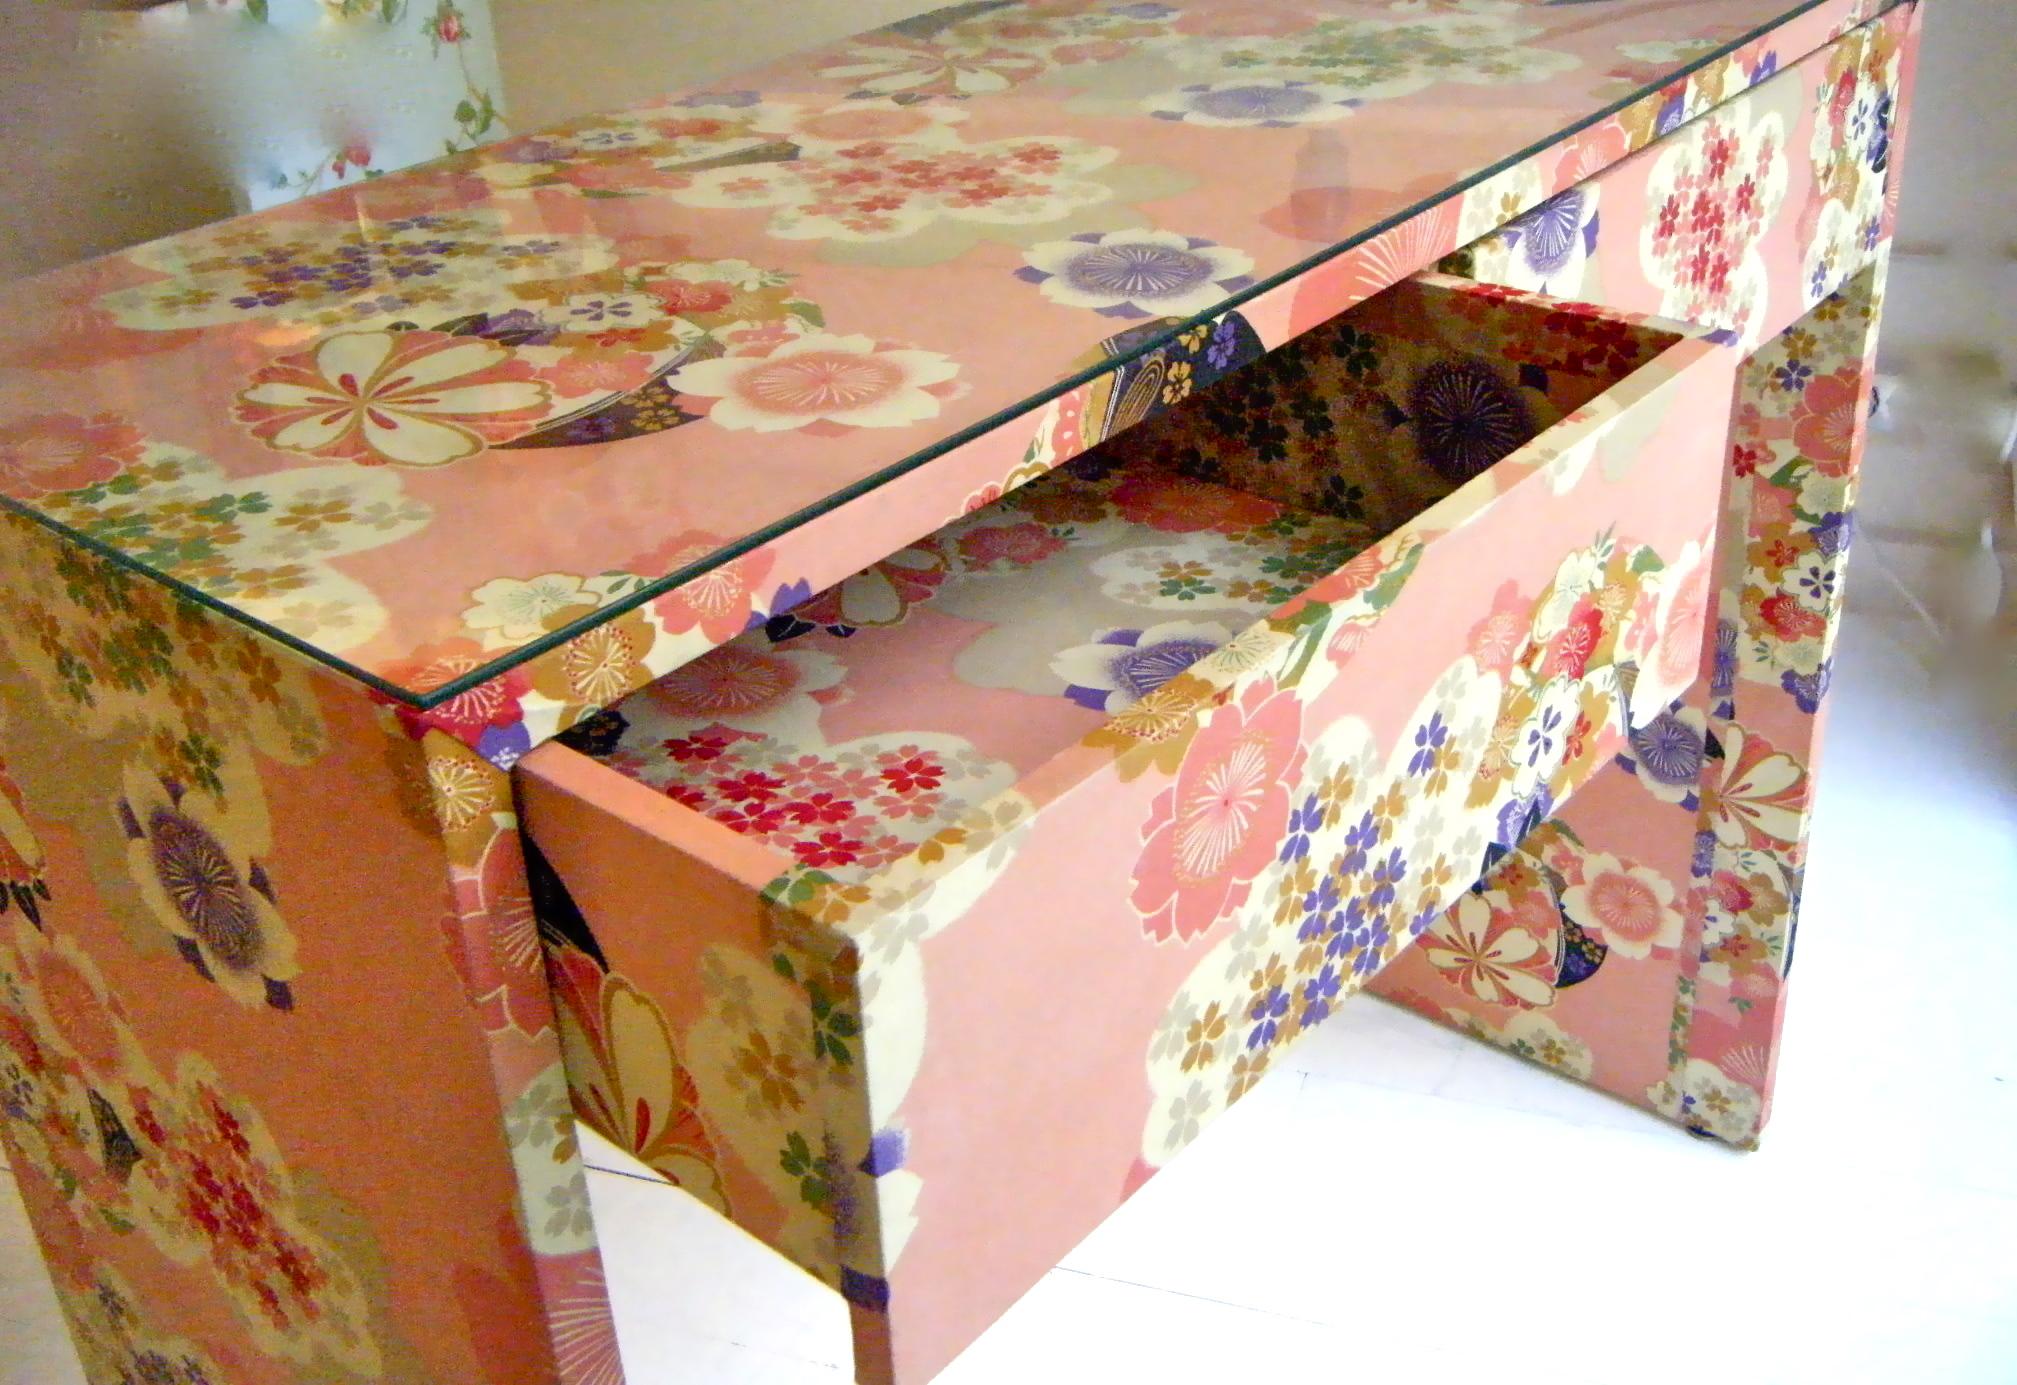 Muebles forrados estardelux for Tela para forrar muebles